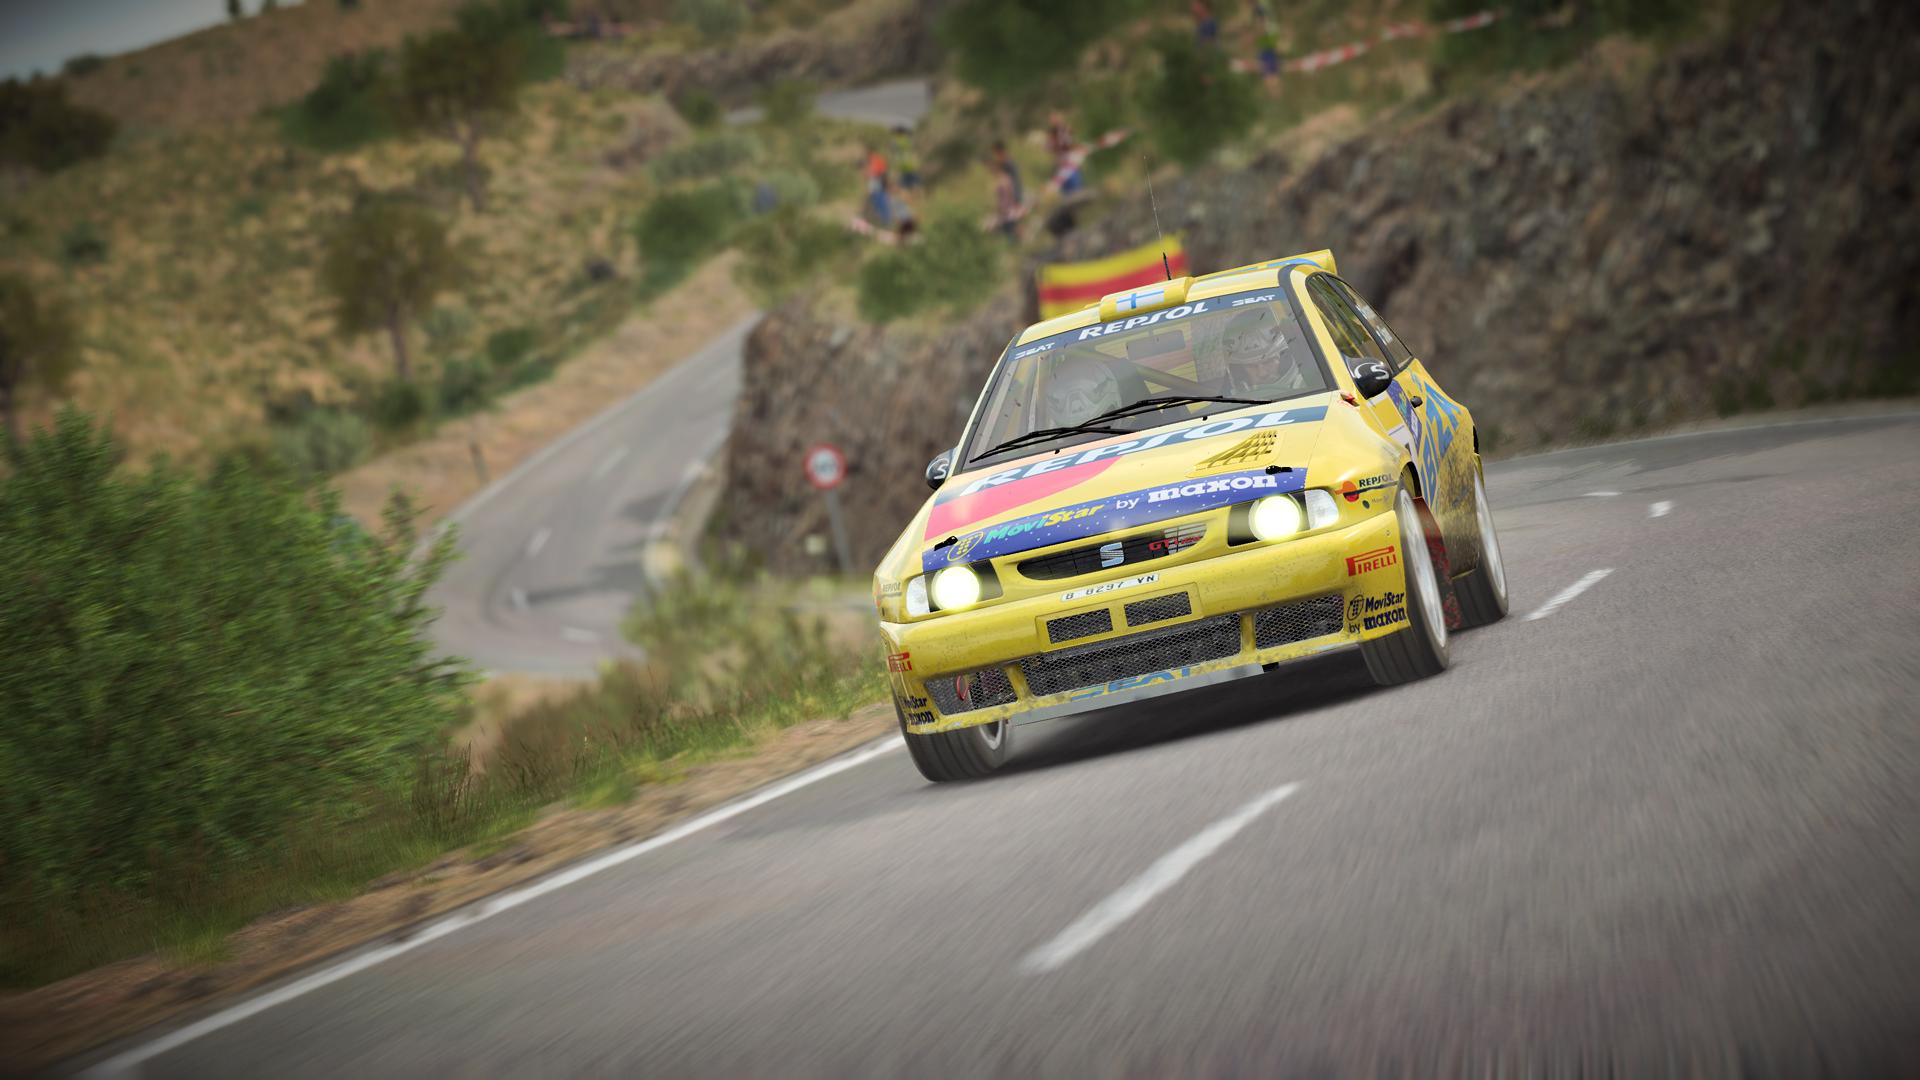 Seat rally car Dirt 4